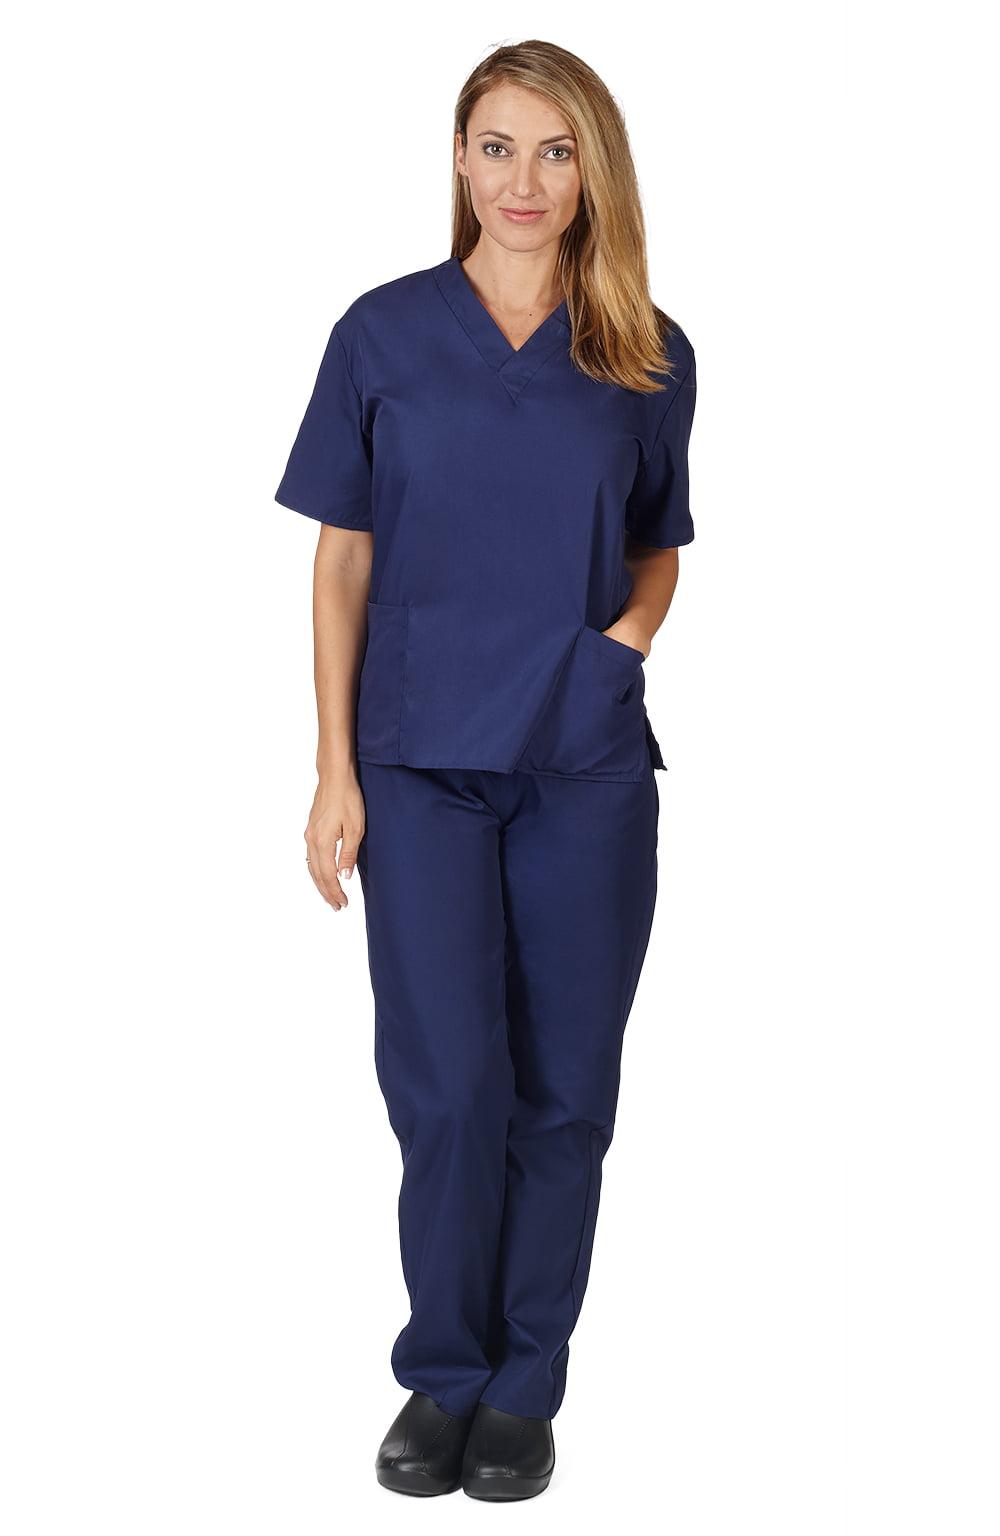 Details about  /Nurse uniform scrub top xs sm med lg xl 2x 3x 4x 5x 6x ANGRY BIRD STAR WARS